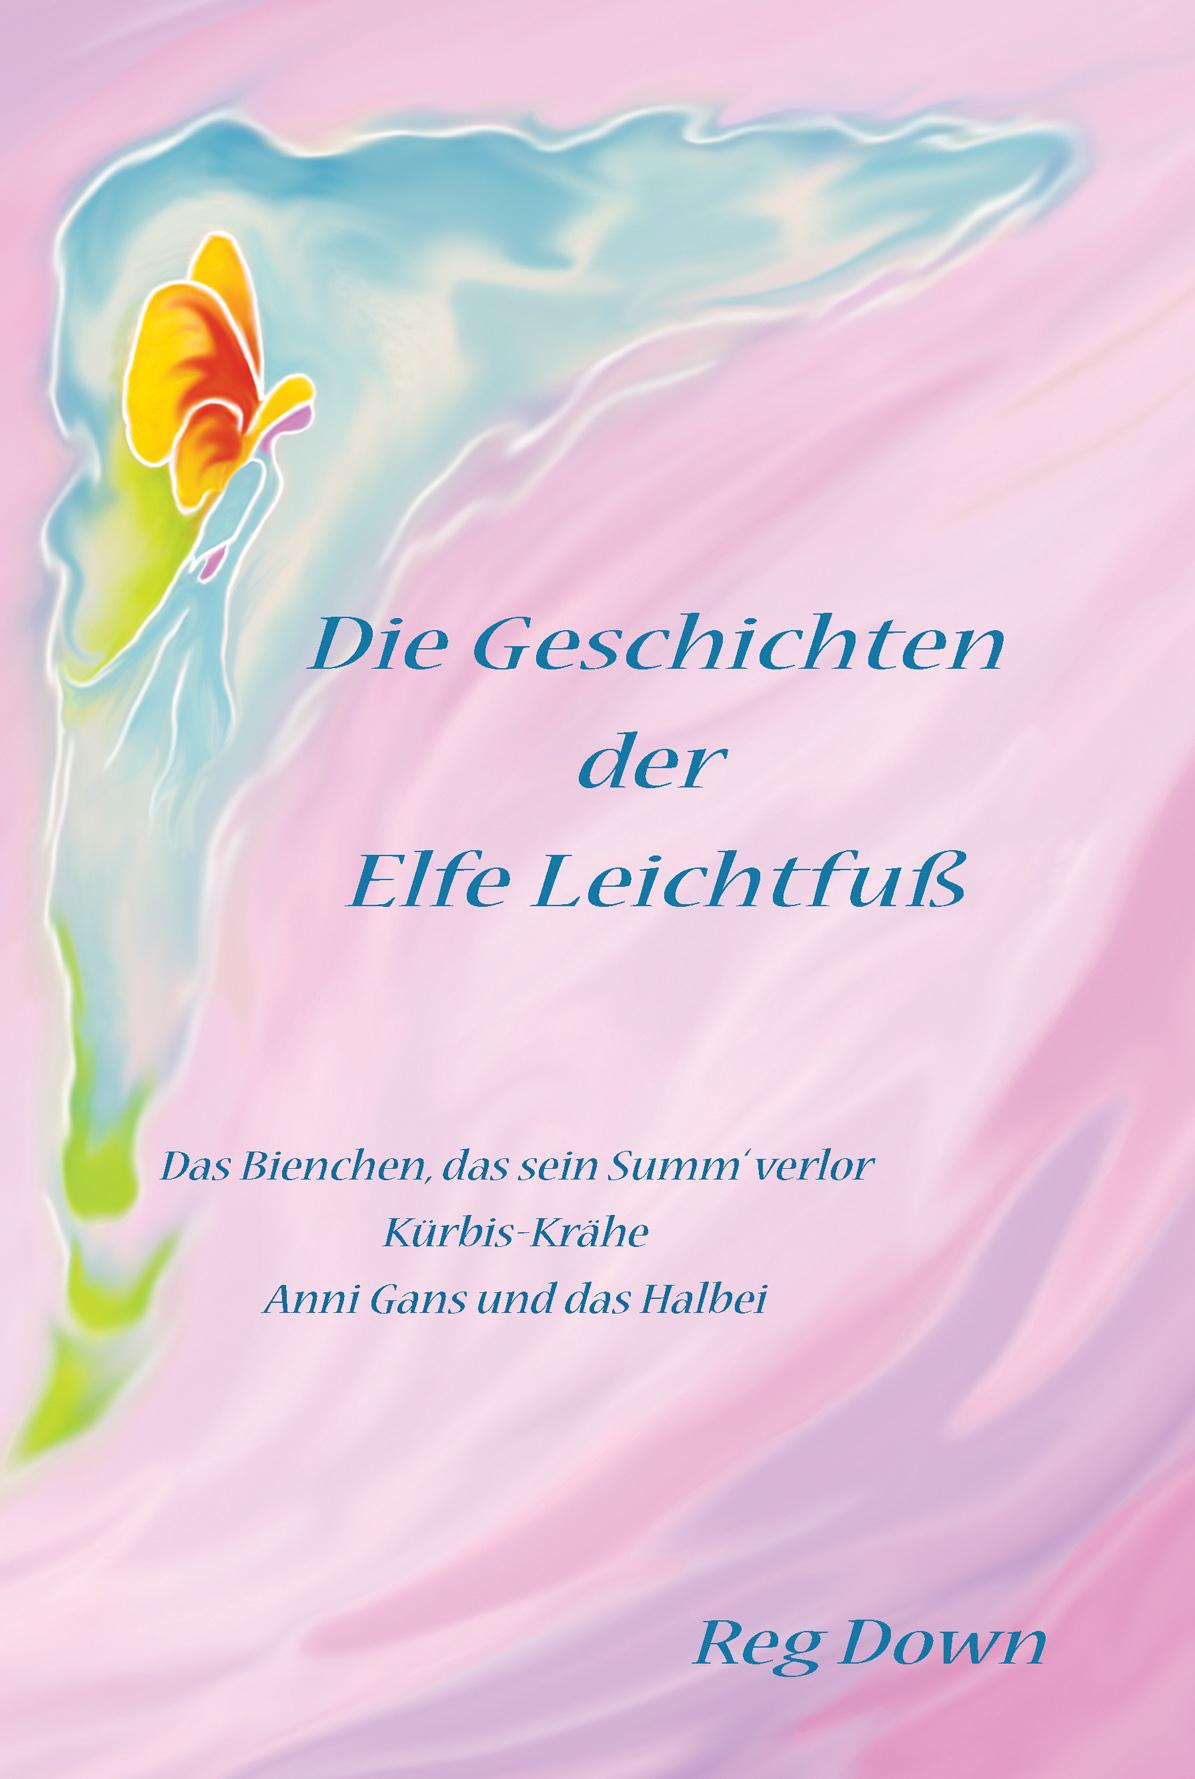 TT-German-FrCvr-print copy - Copy.jpg